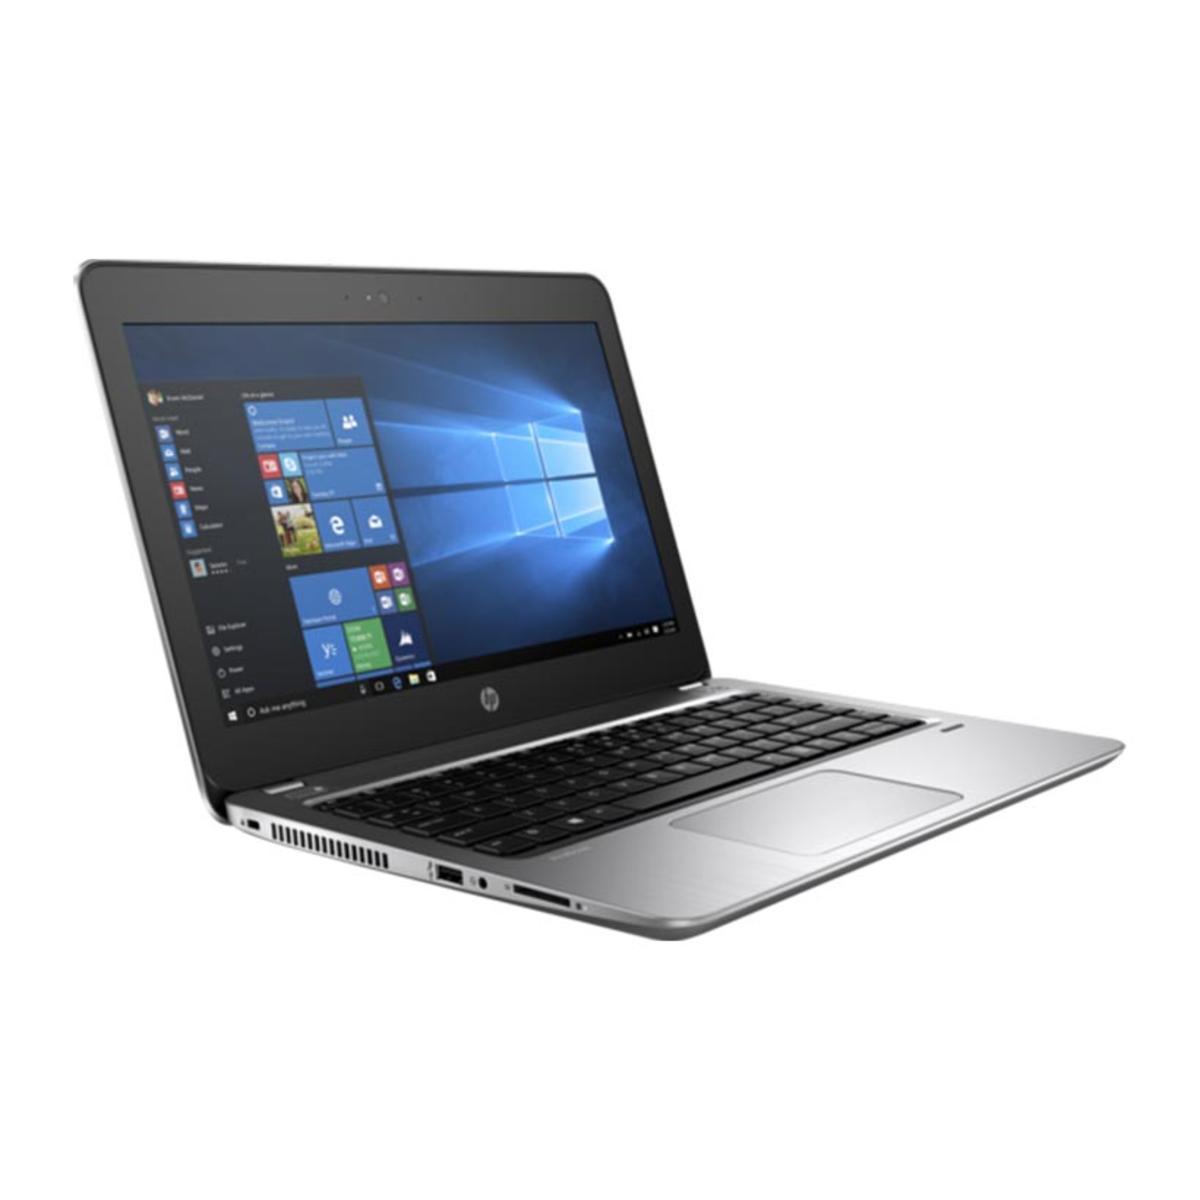 Laptop HP ProBook 430 G4 (Z6T07PA)